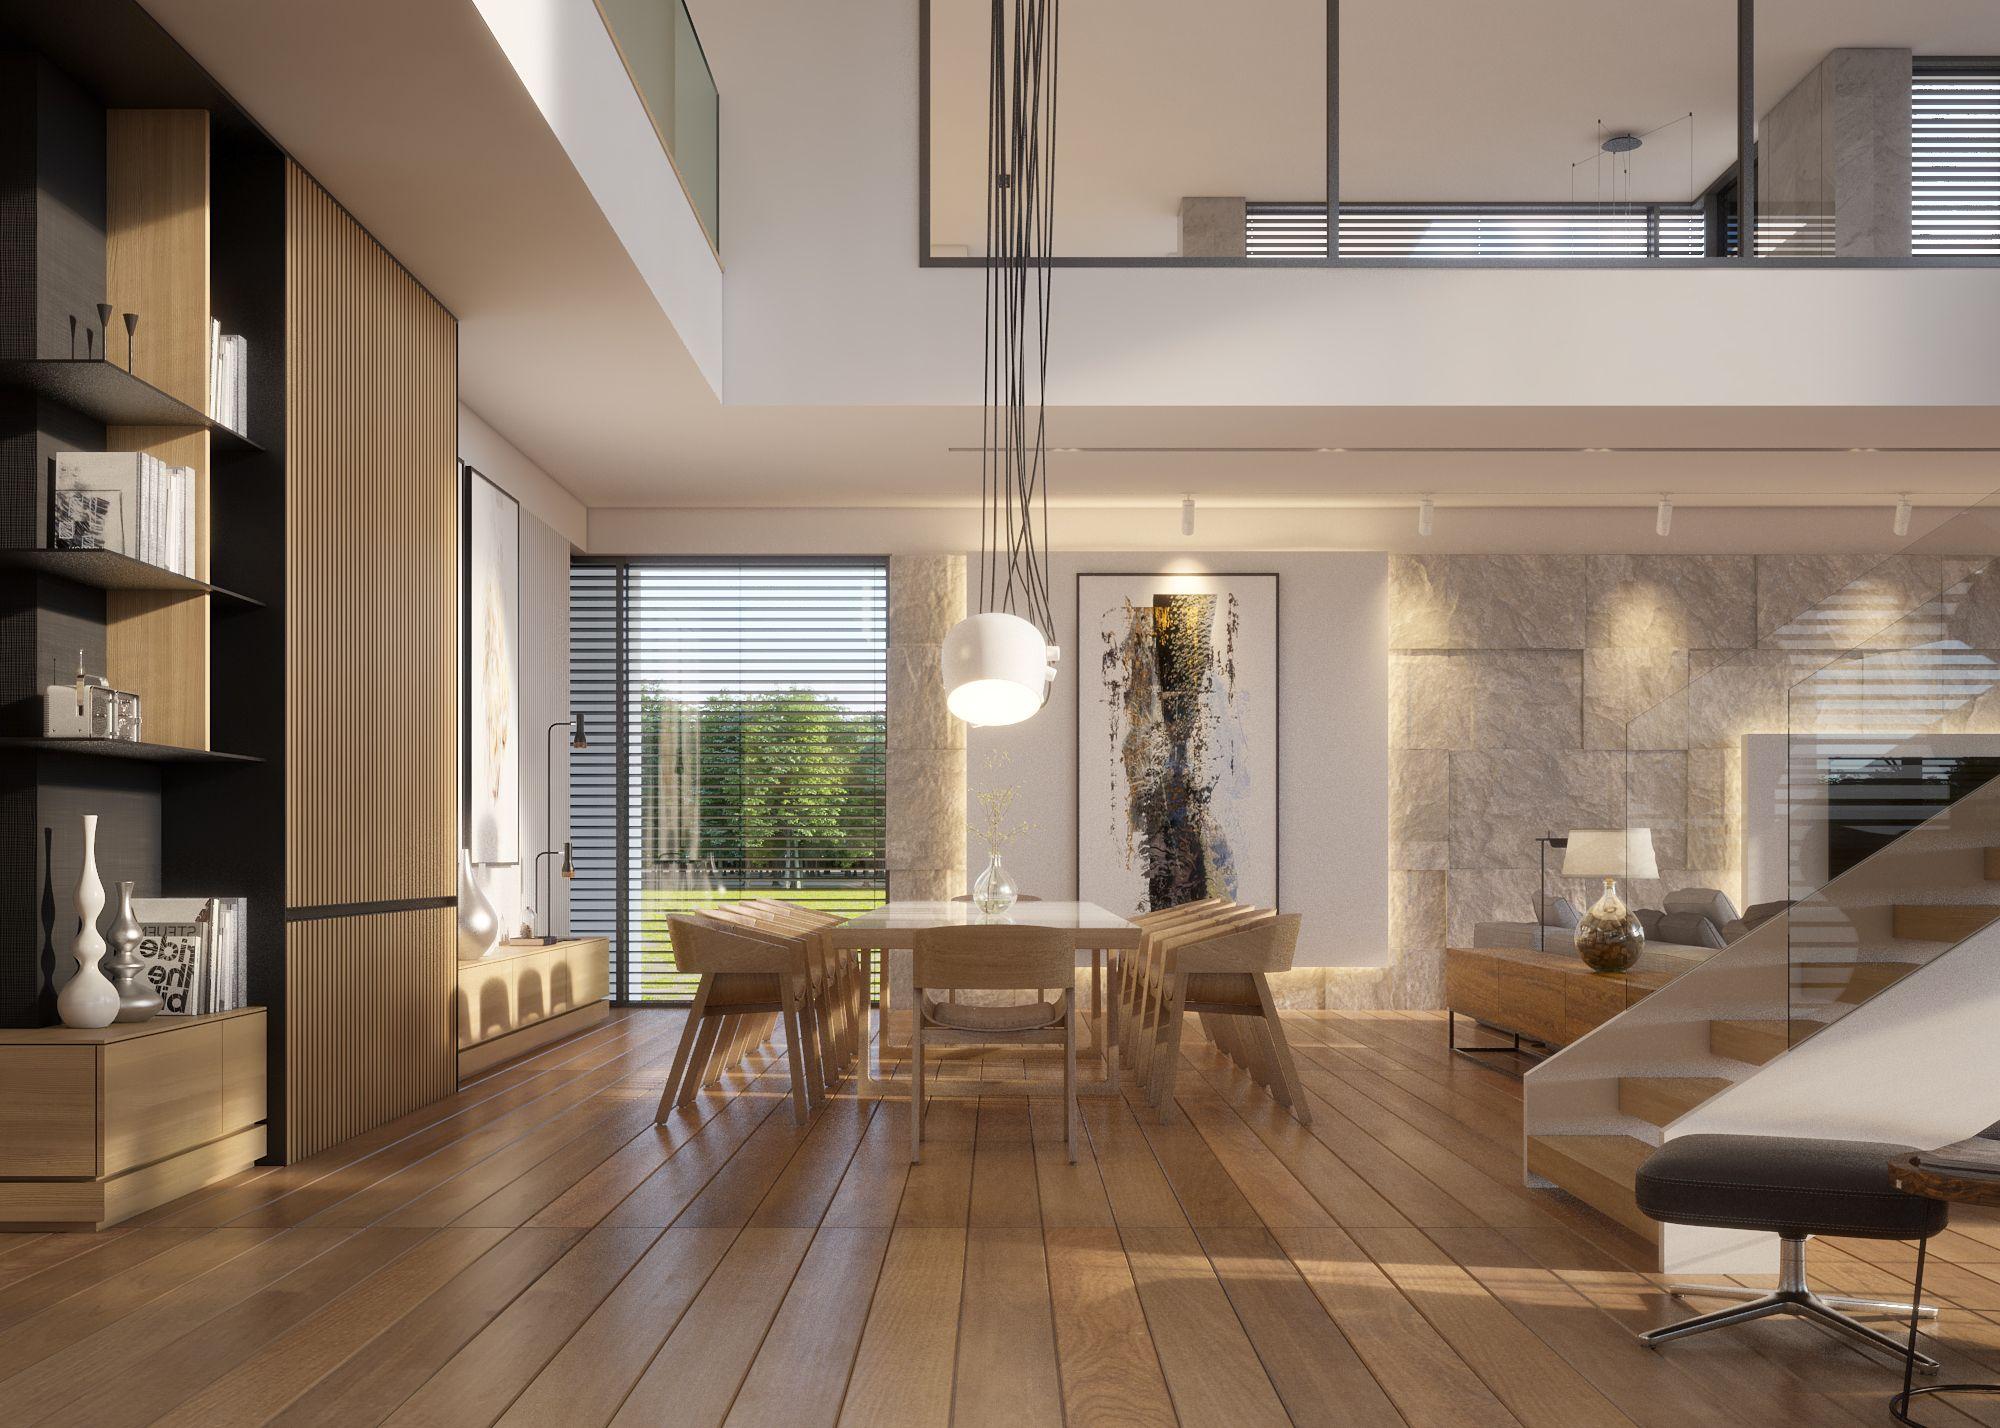 25 Warm Living Room Design Ideas For Comfortable Feel ...